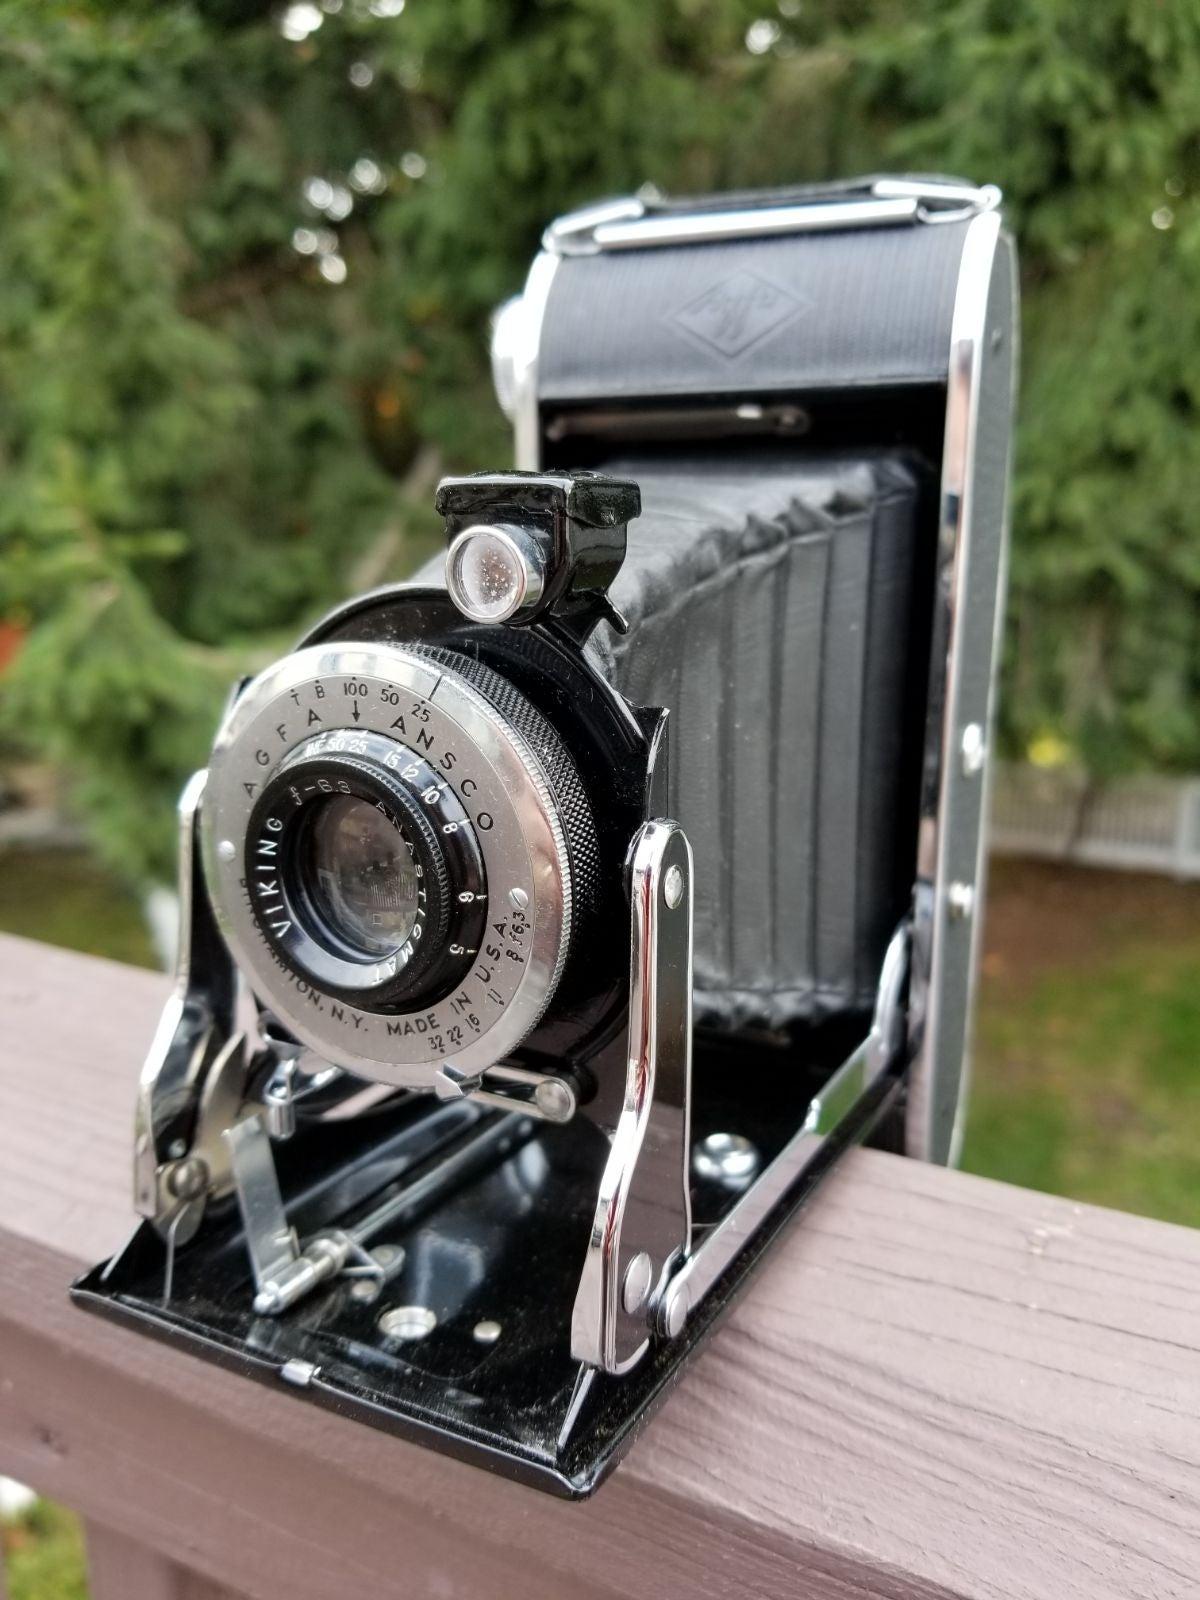 AGFA Viking PD16 F6.3 Folding Camera